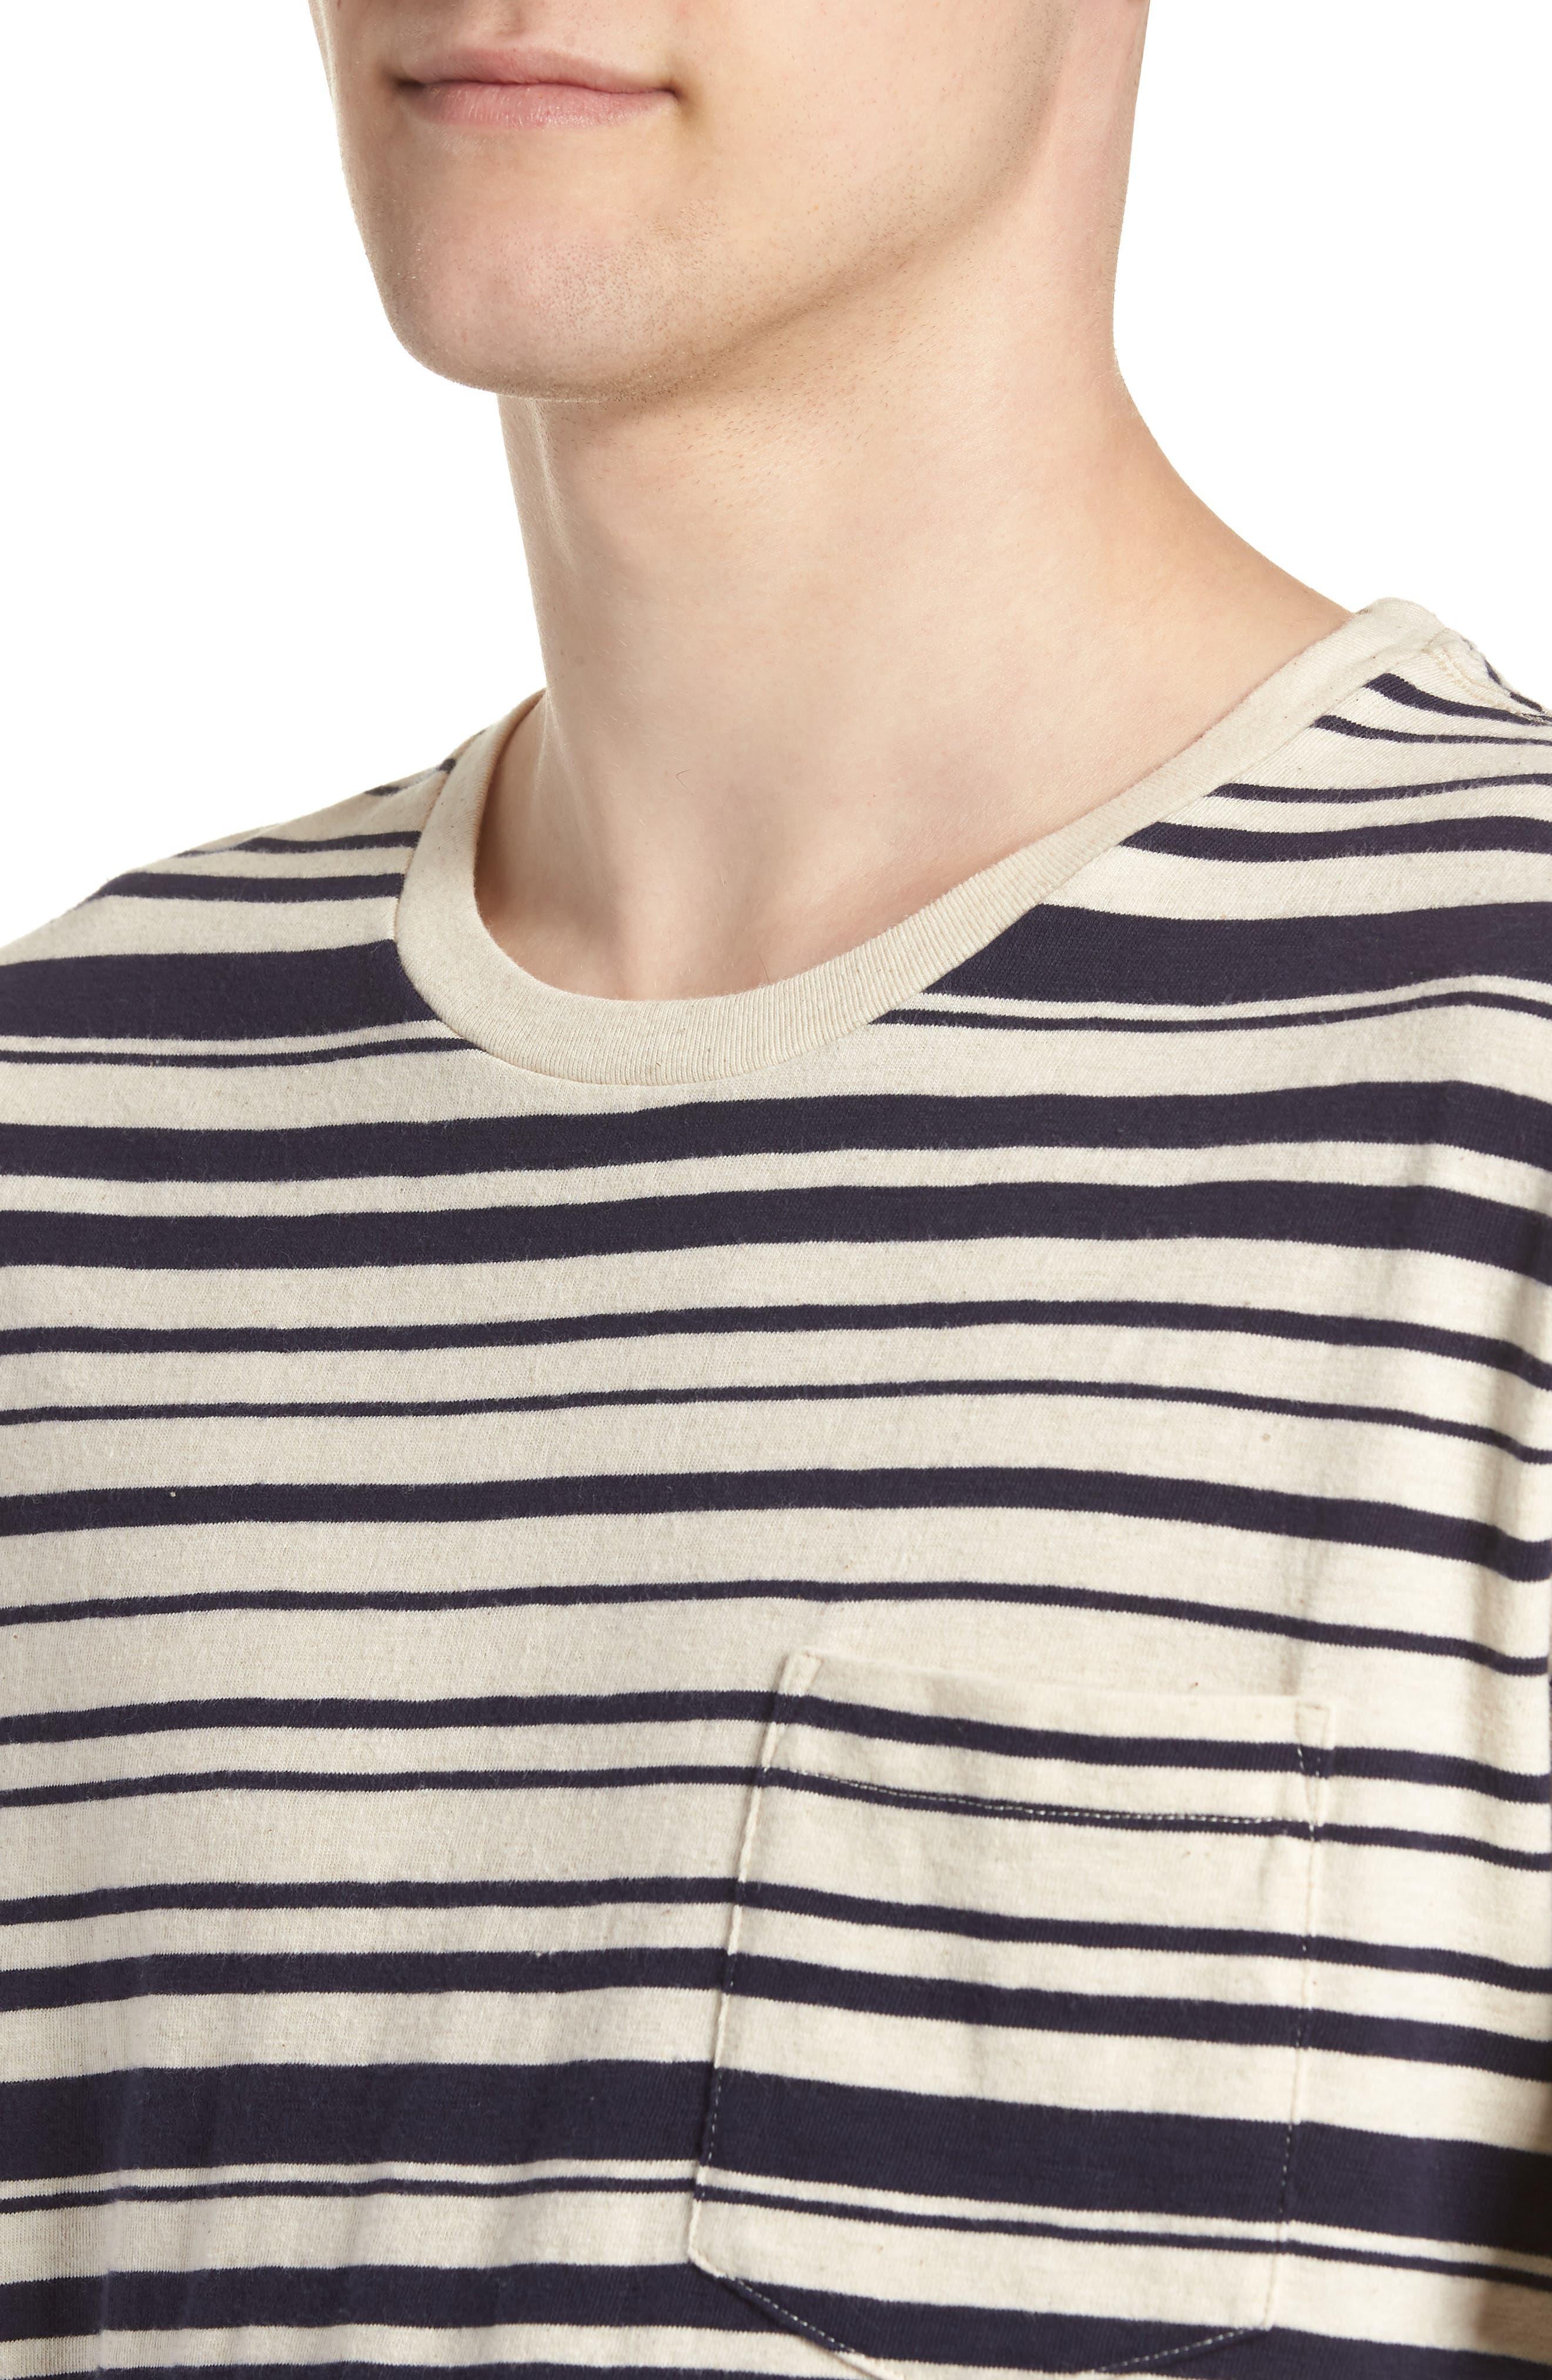 Variegated Stripe Slub Cotton T-Shirt,                             Alternate thumbnail 4, color,                             Ivory Navy